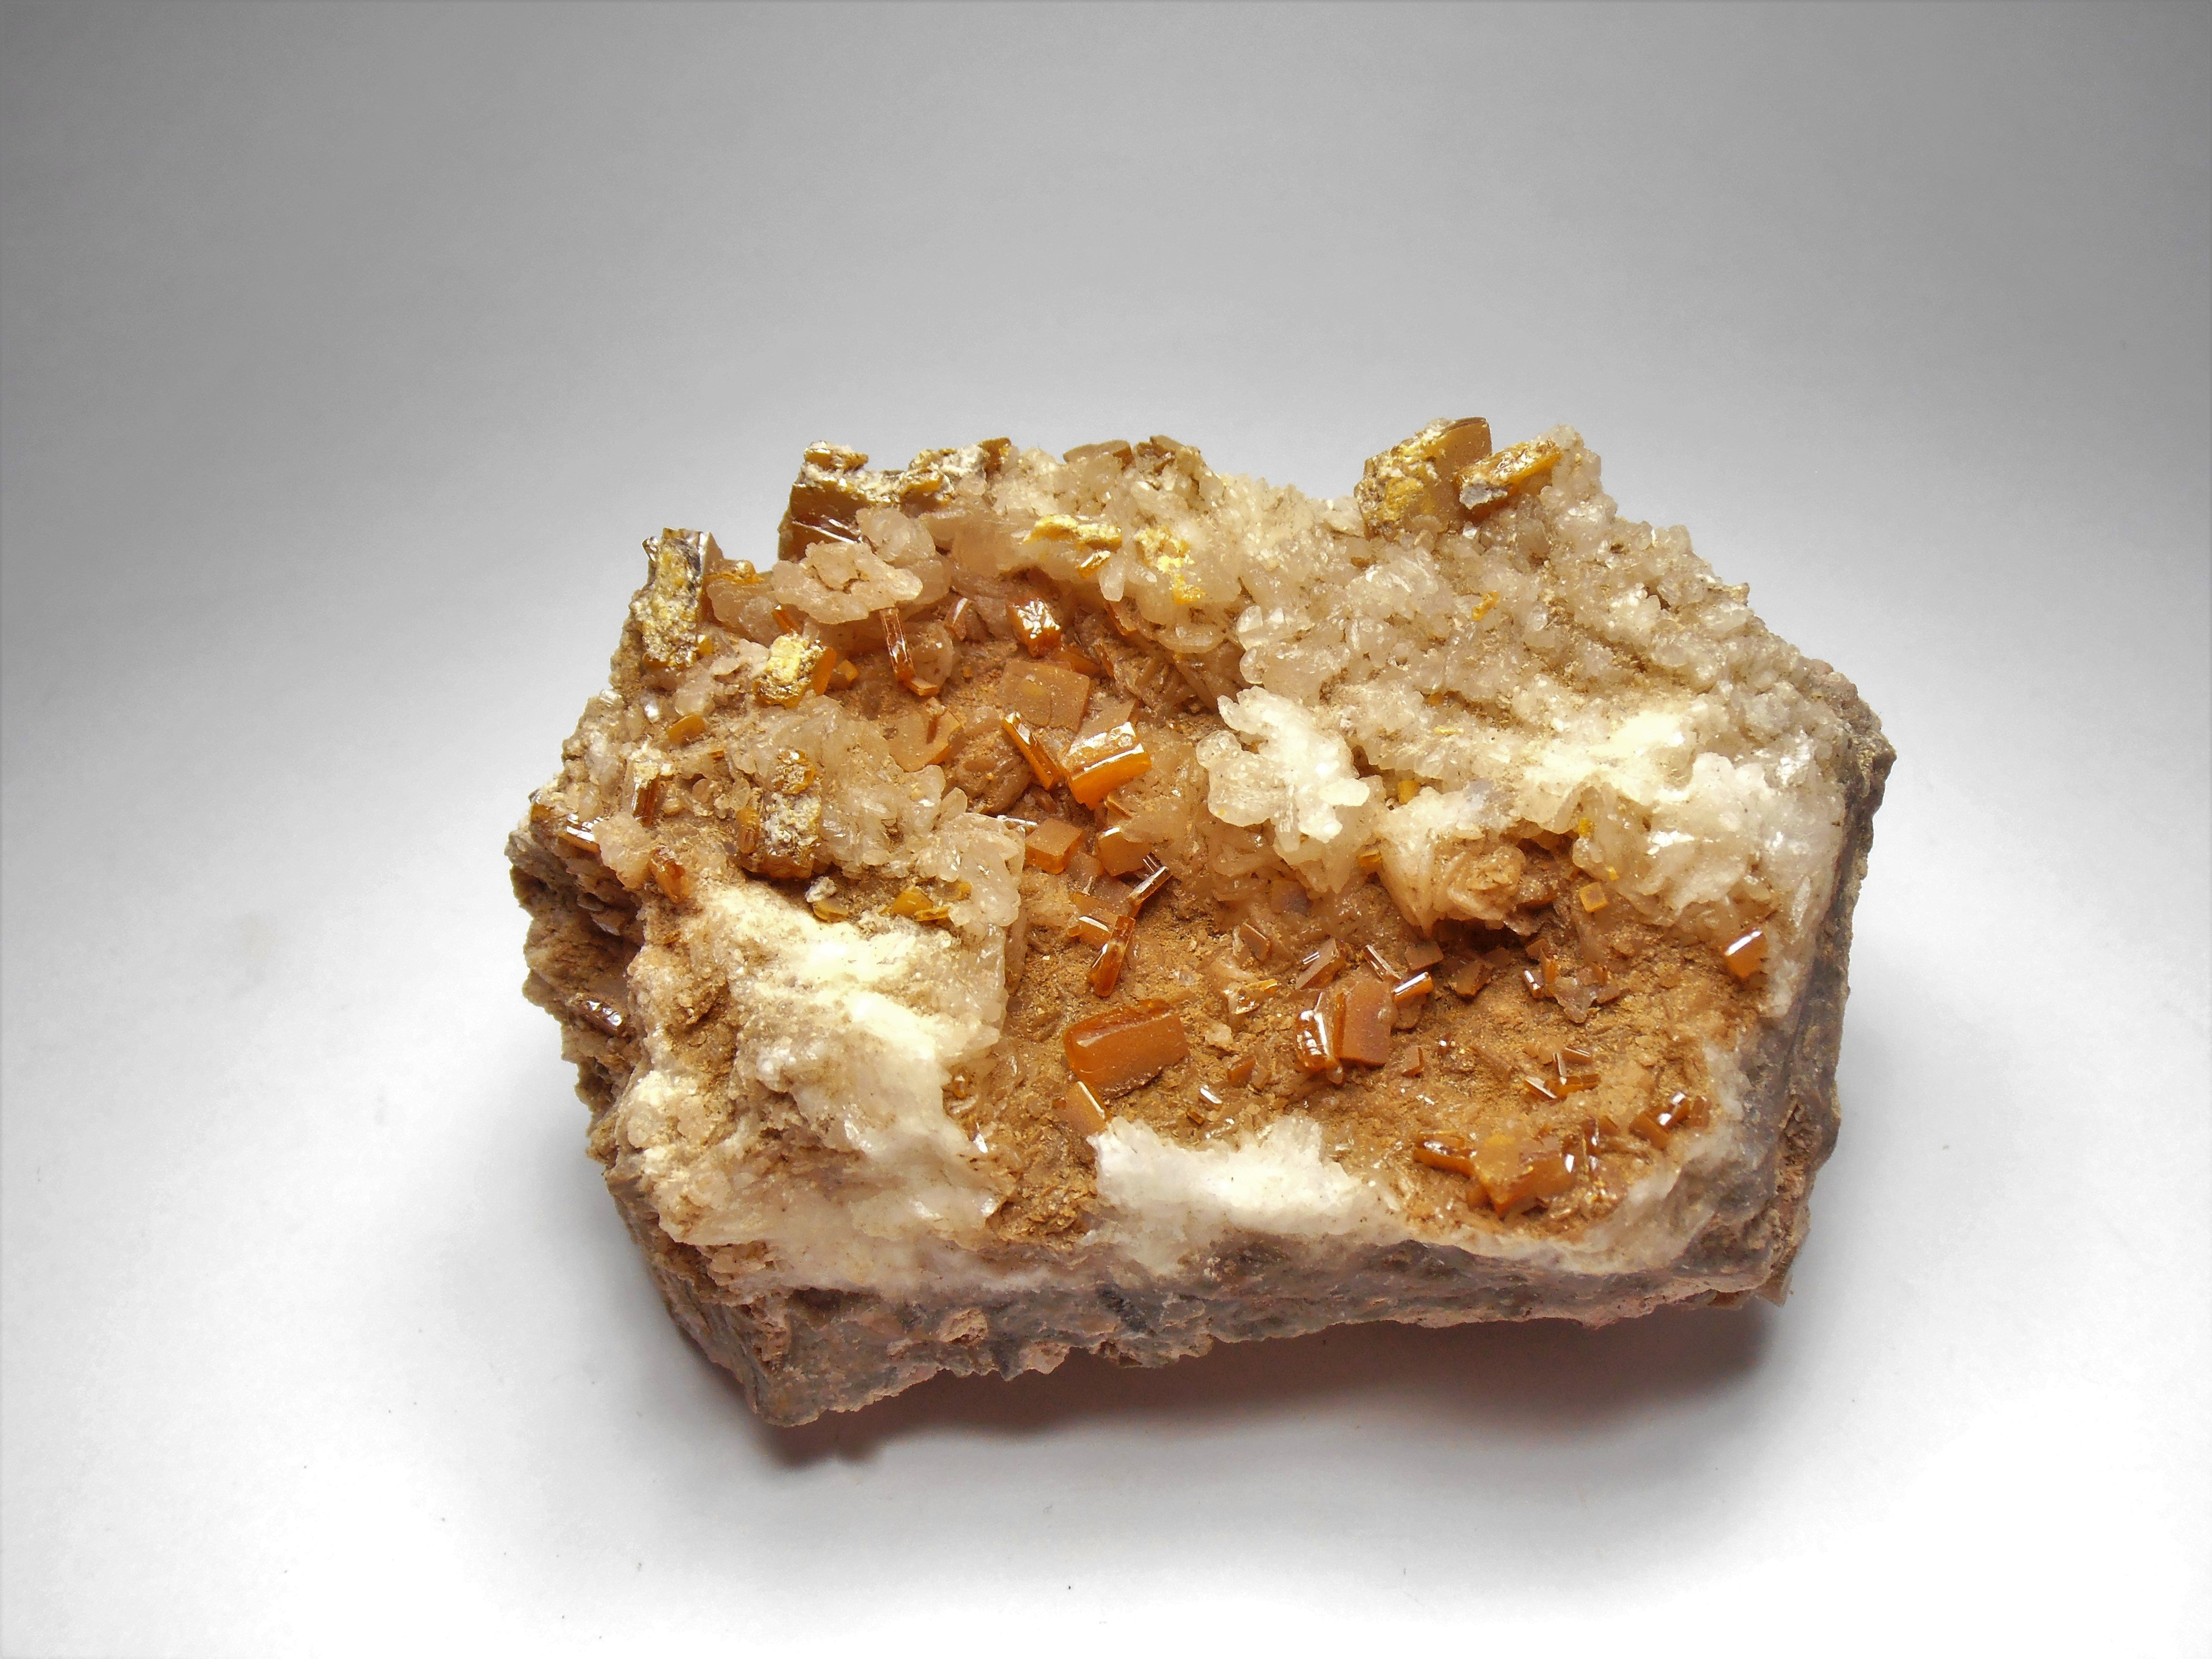 Wulfenite from the Rowley Mine, Maricopa County